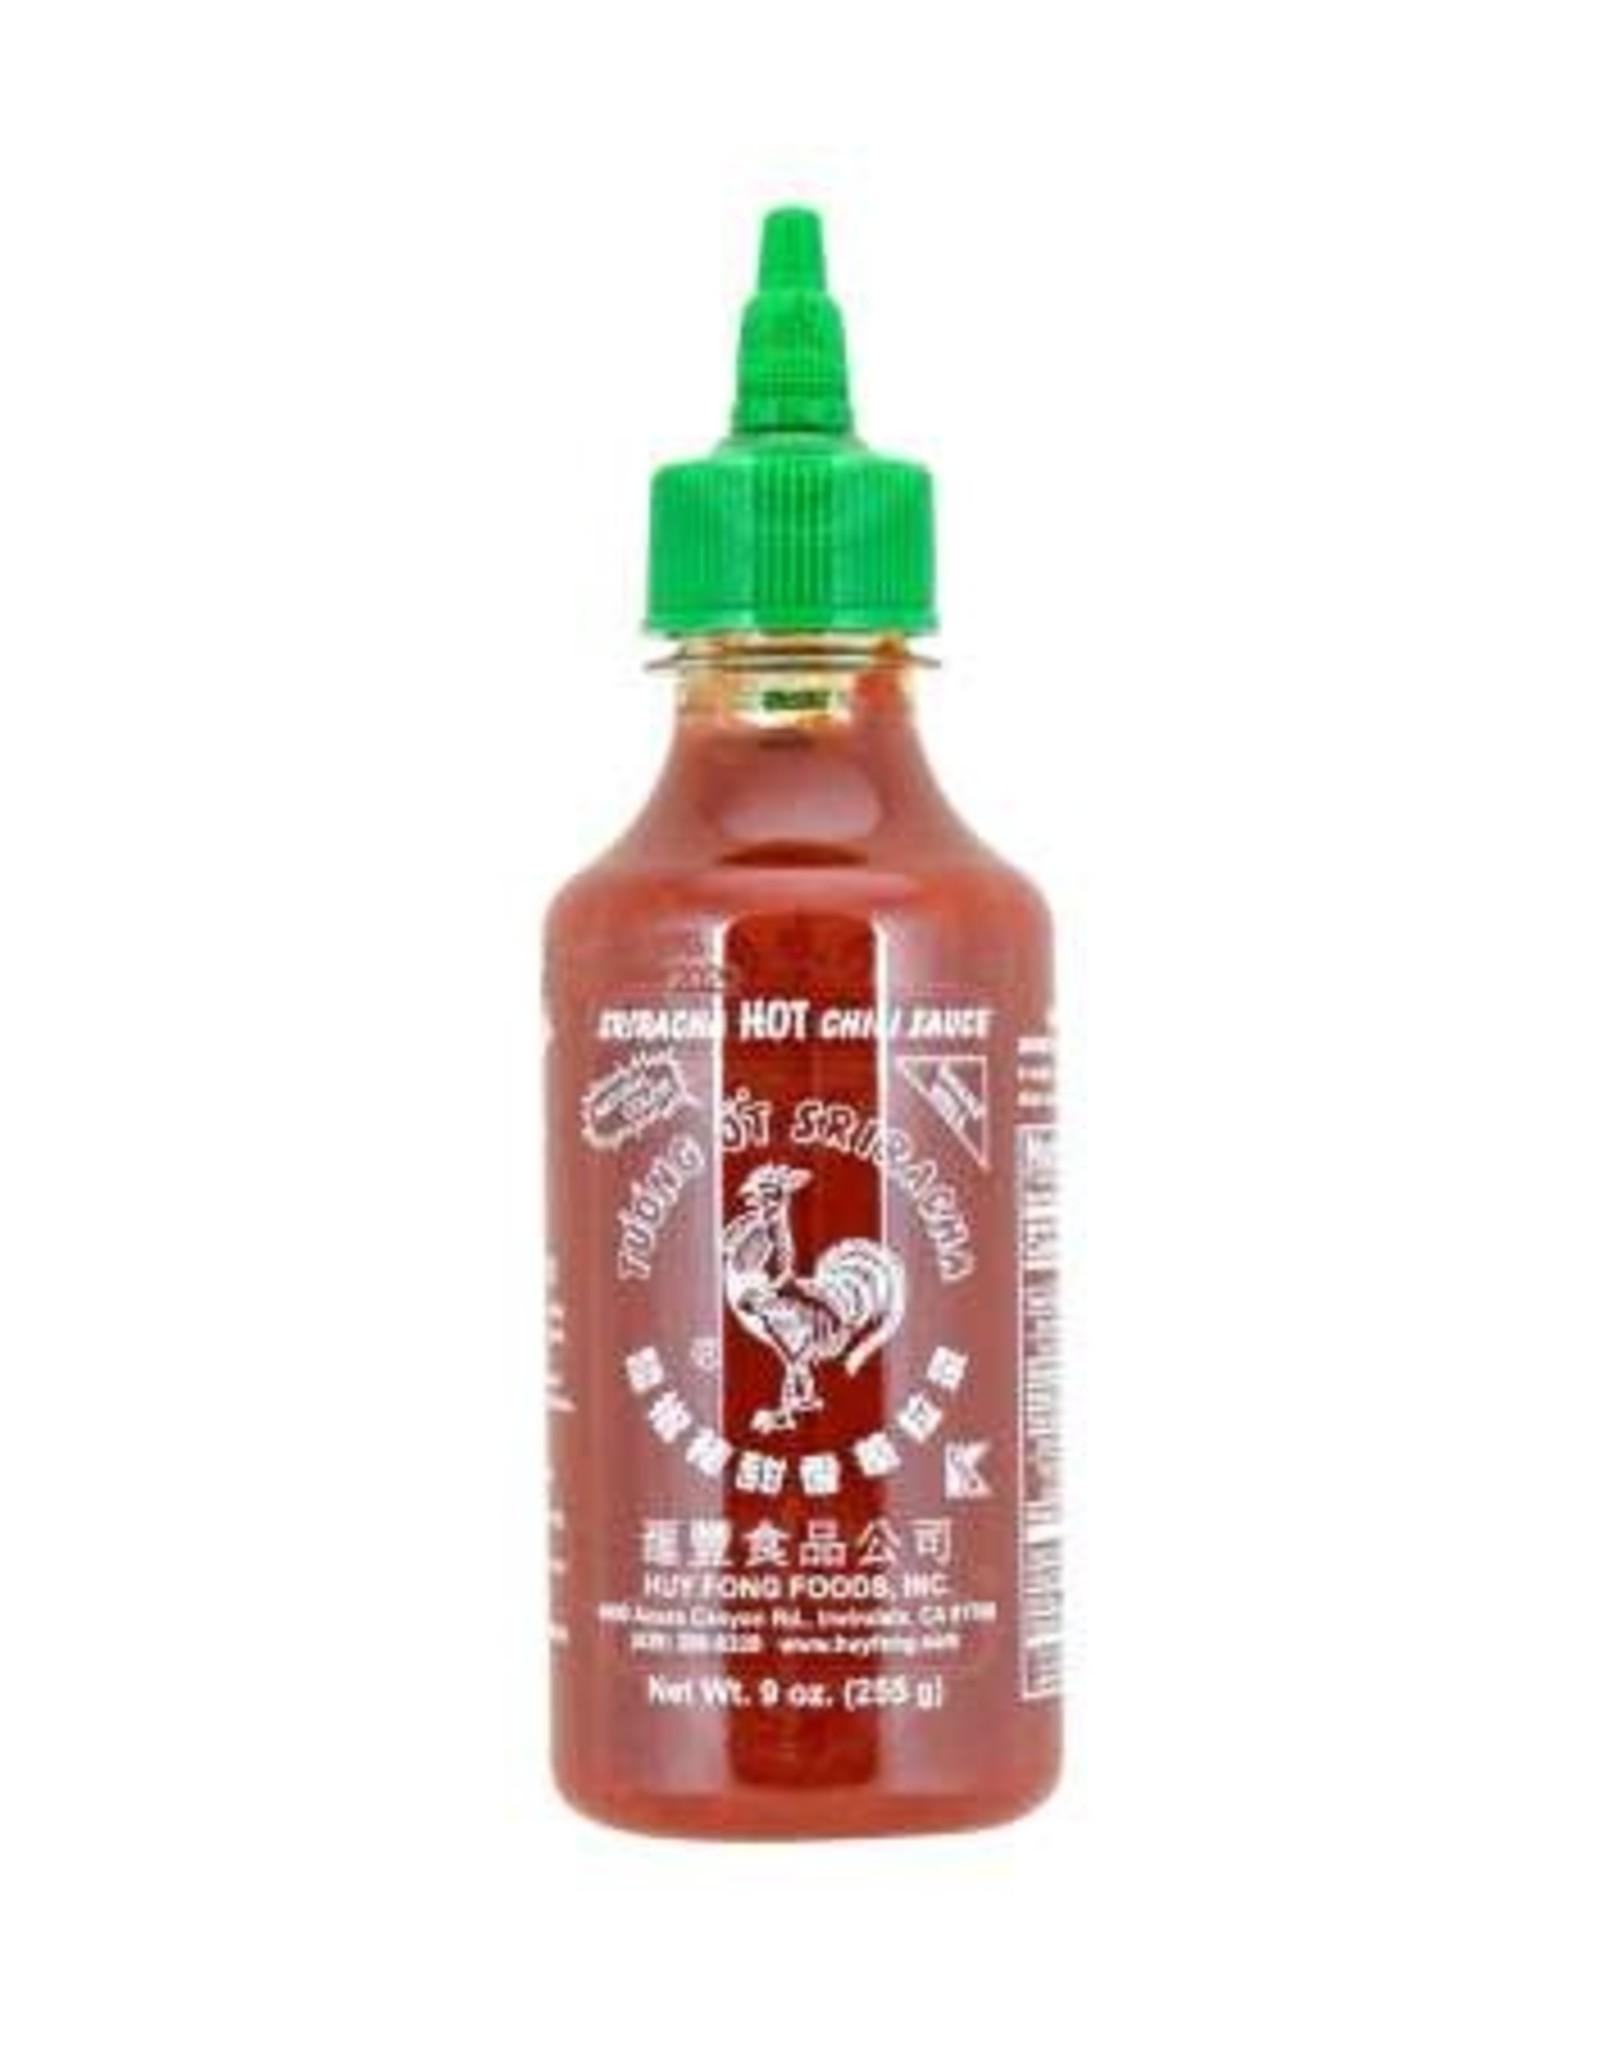 Hf Sriracha Sauce Usa 255G (Pet)